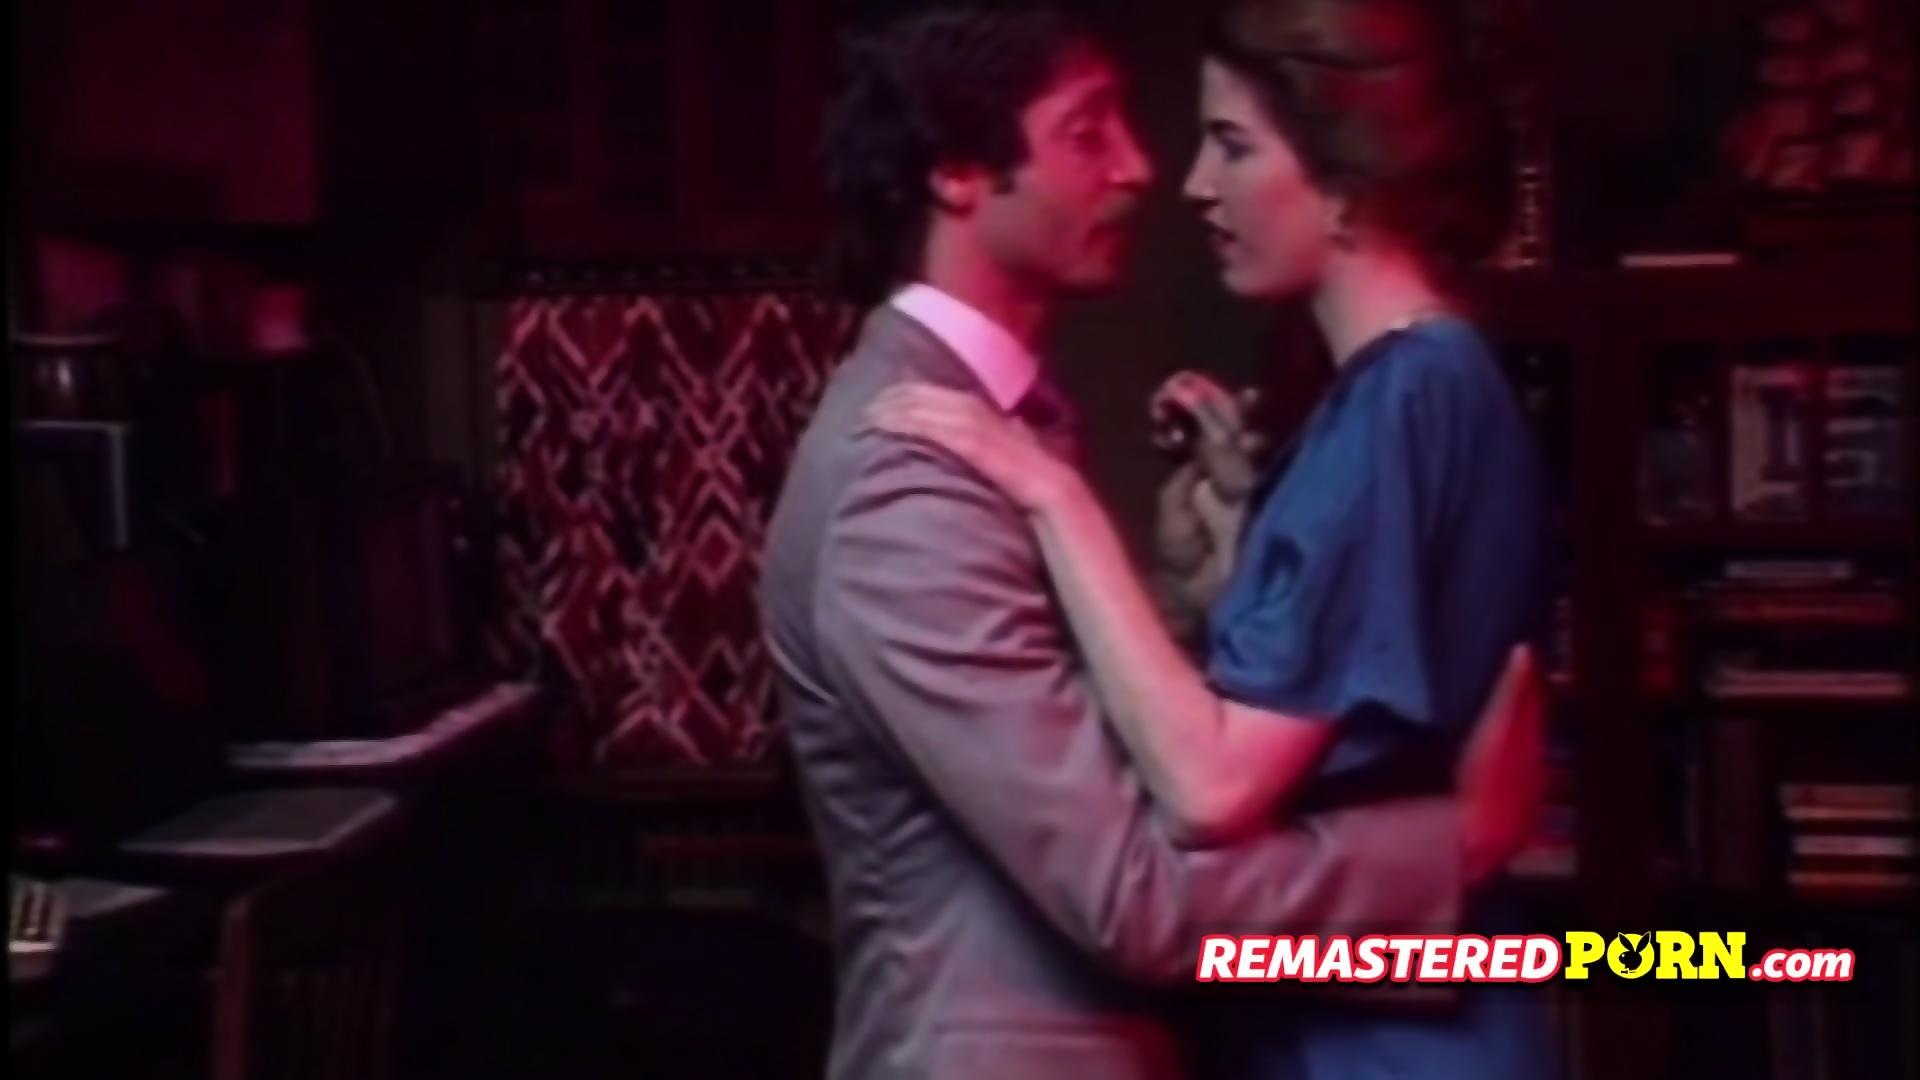 Hot Romantic Lesbian Sex